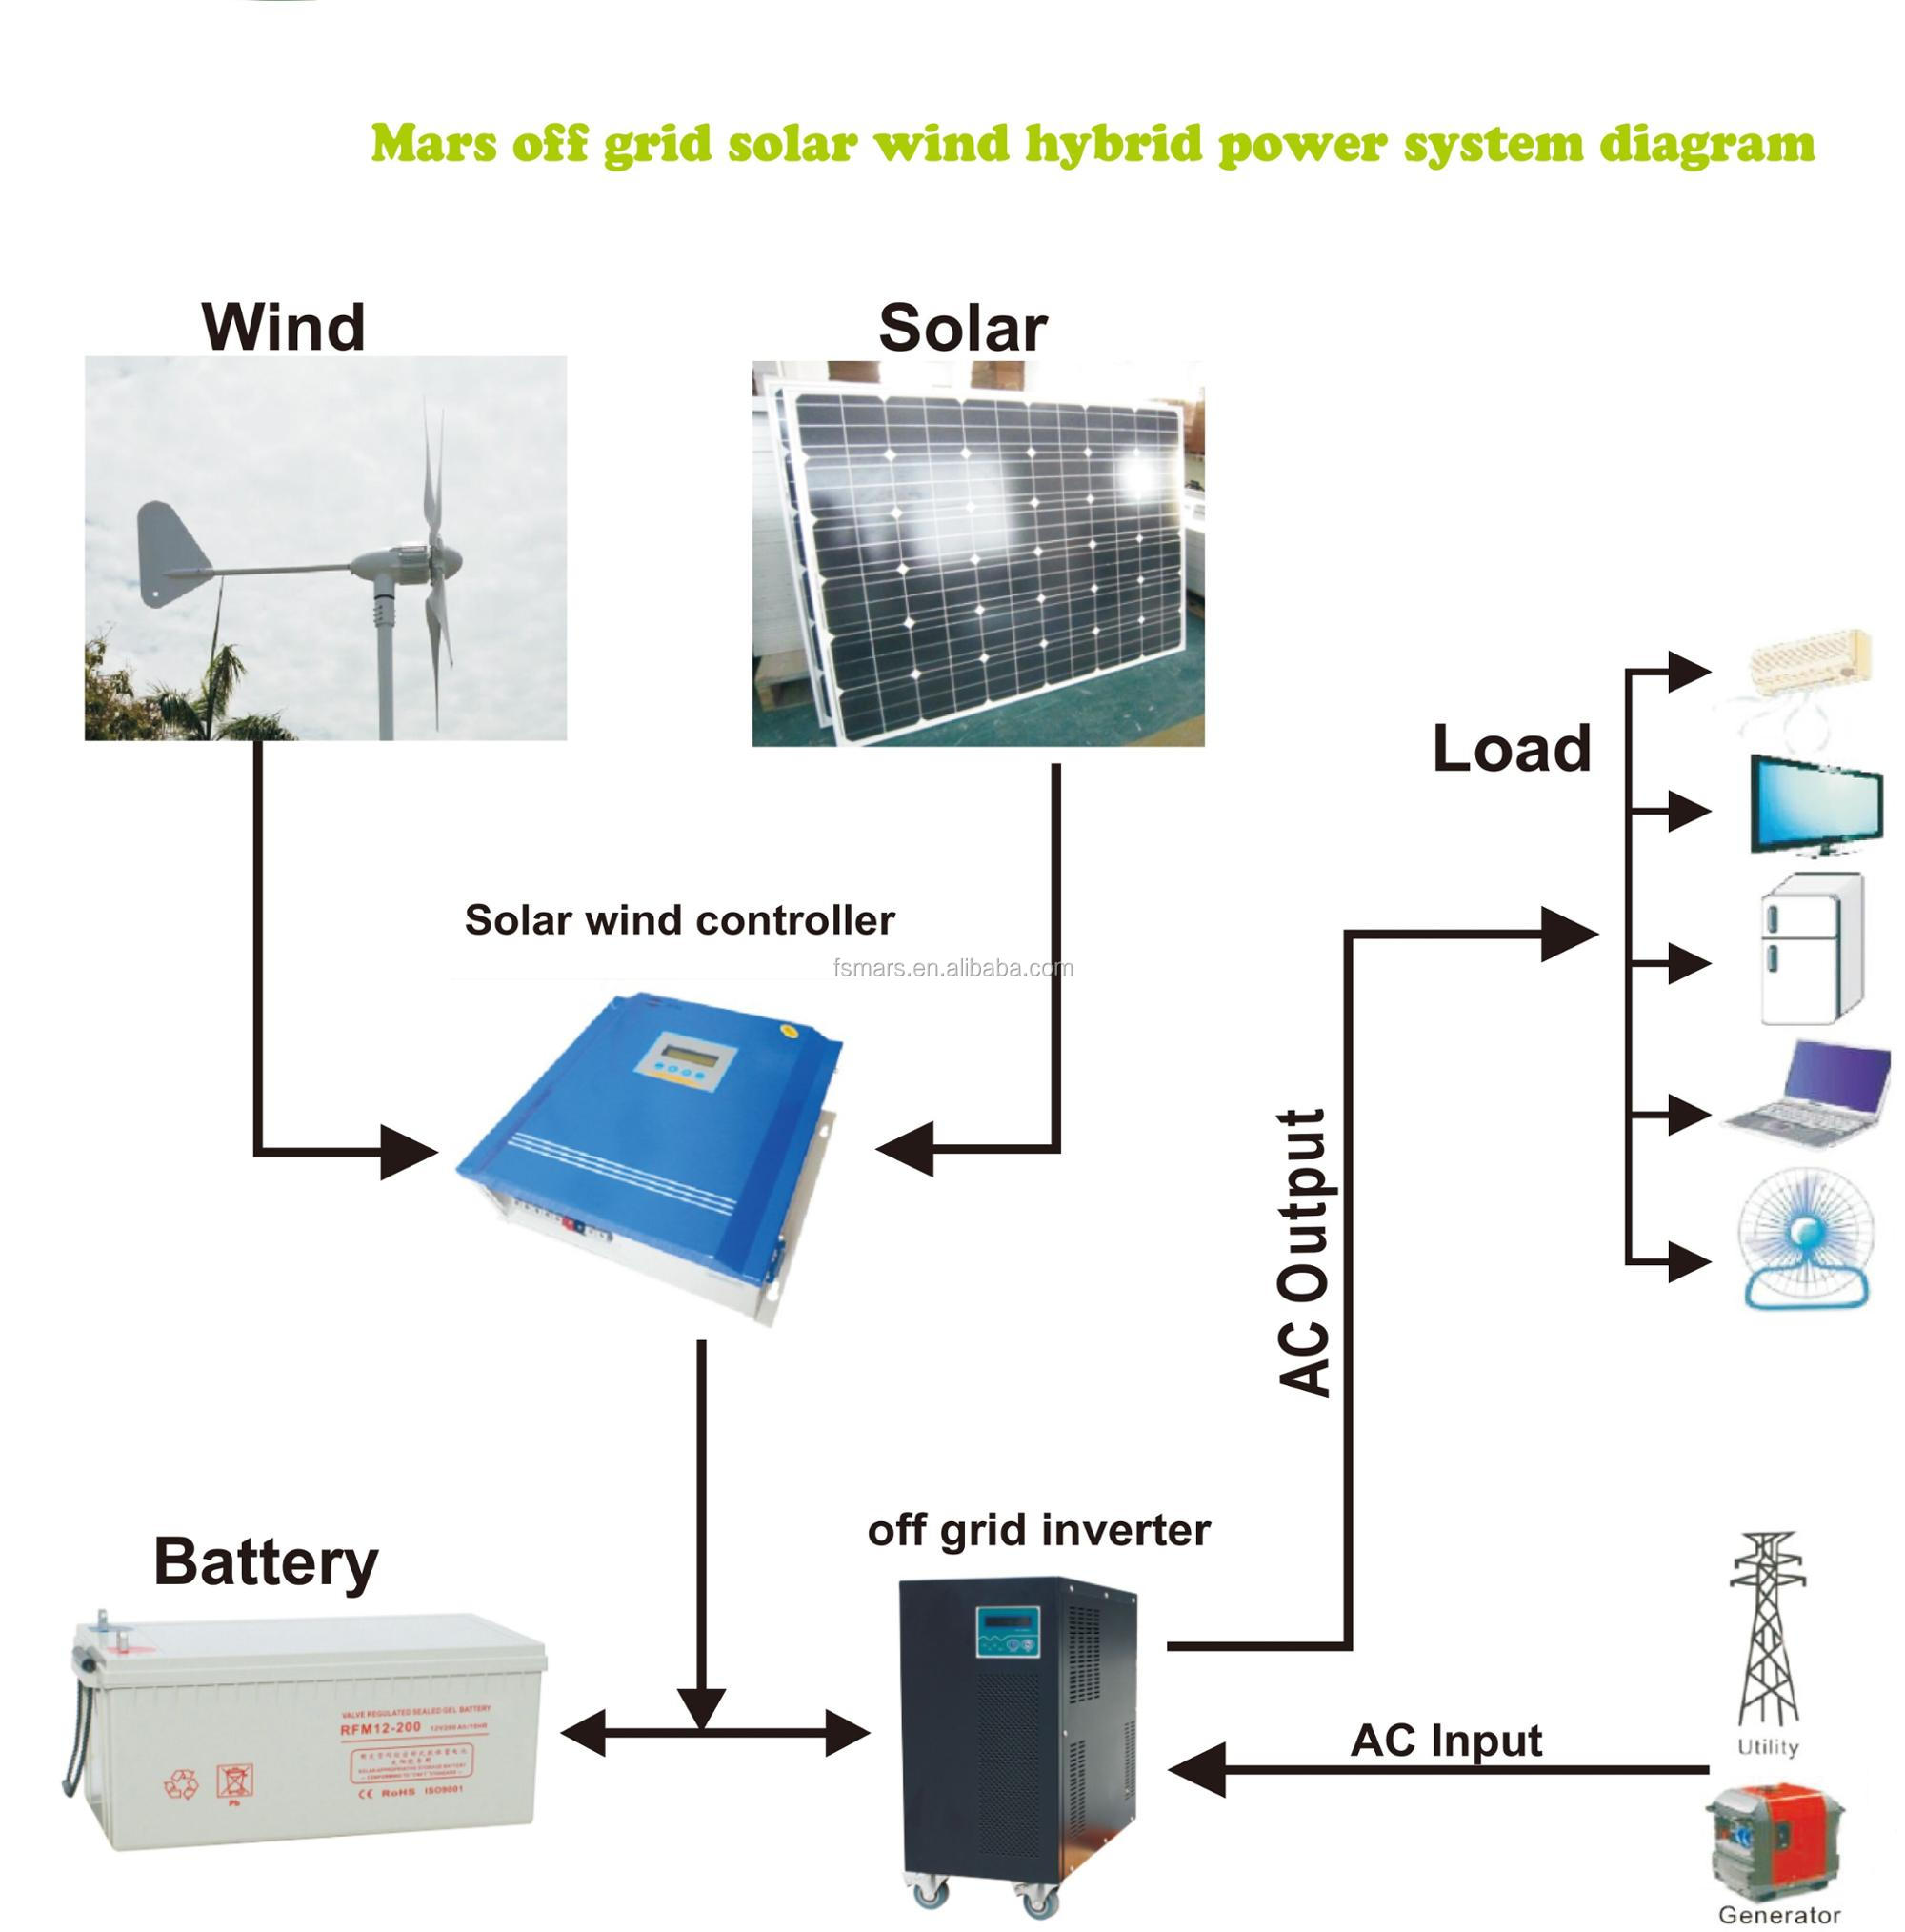 hight resolution of mars wind solar hybrid power system 1kw off grid hybrid solar wind with off grid solar system on off grid wind power system diagram